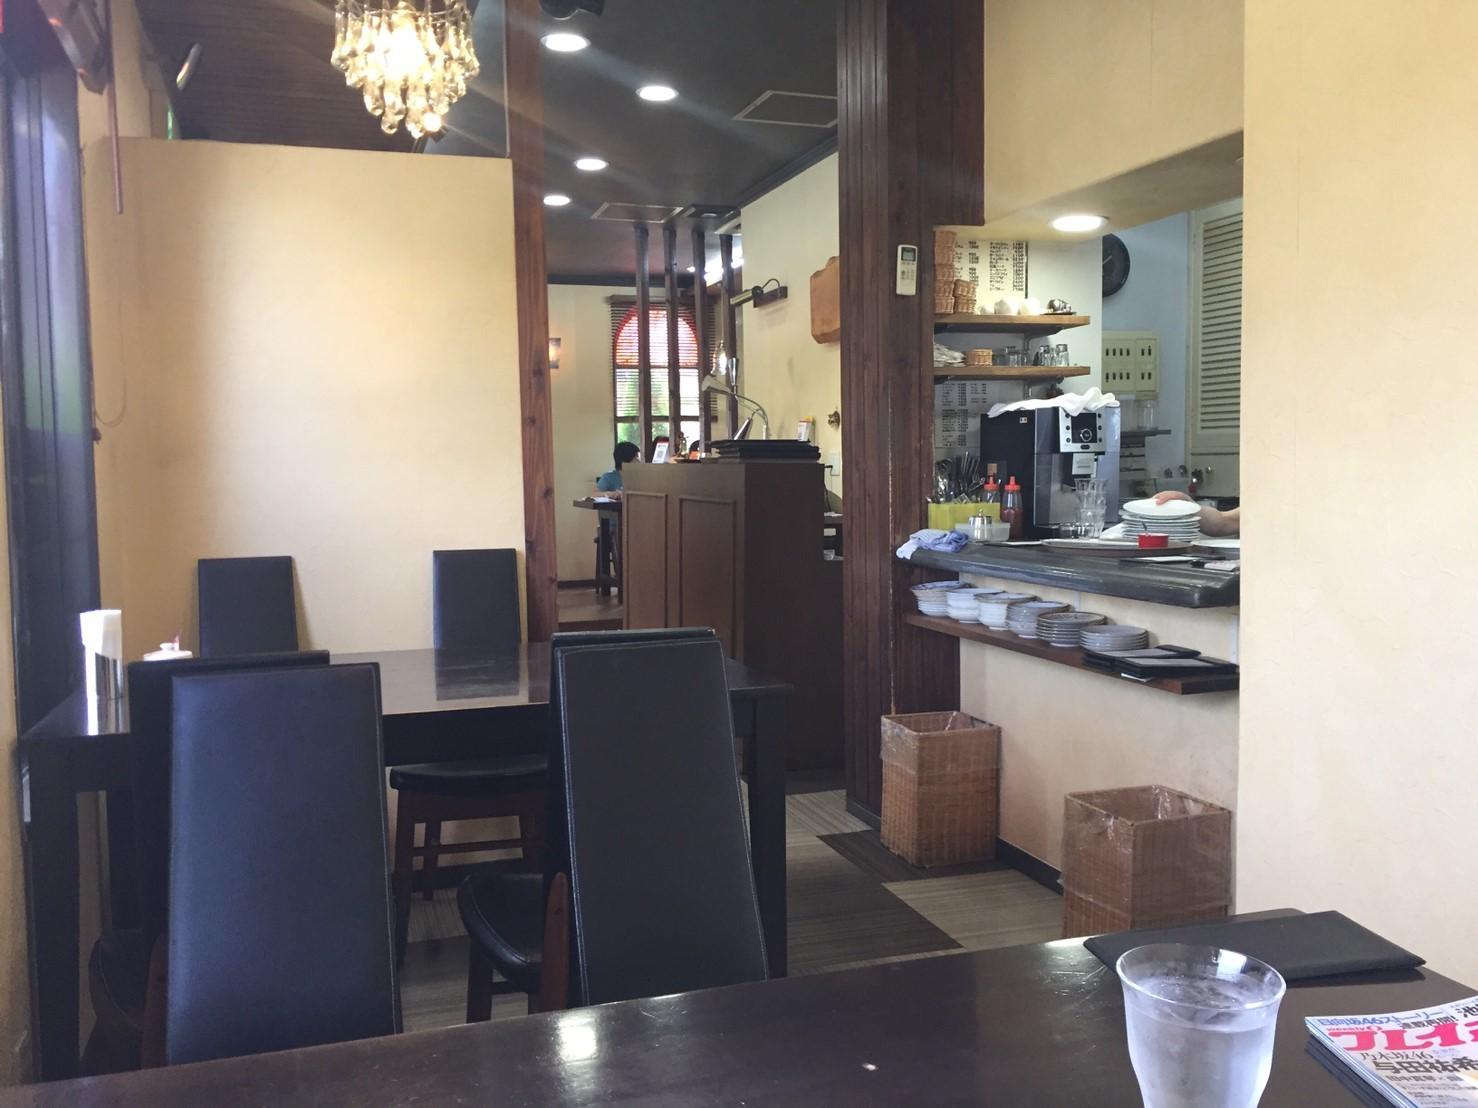 cafe & restaurant アンドリュース 日替わりランチ  ラス1和風ハンバーグ_e0115904_19344070.jpg